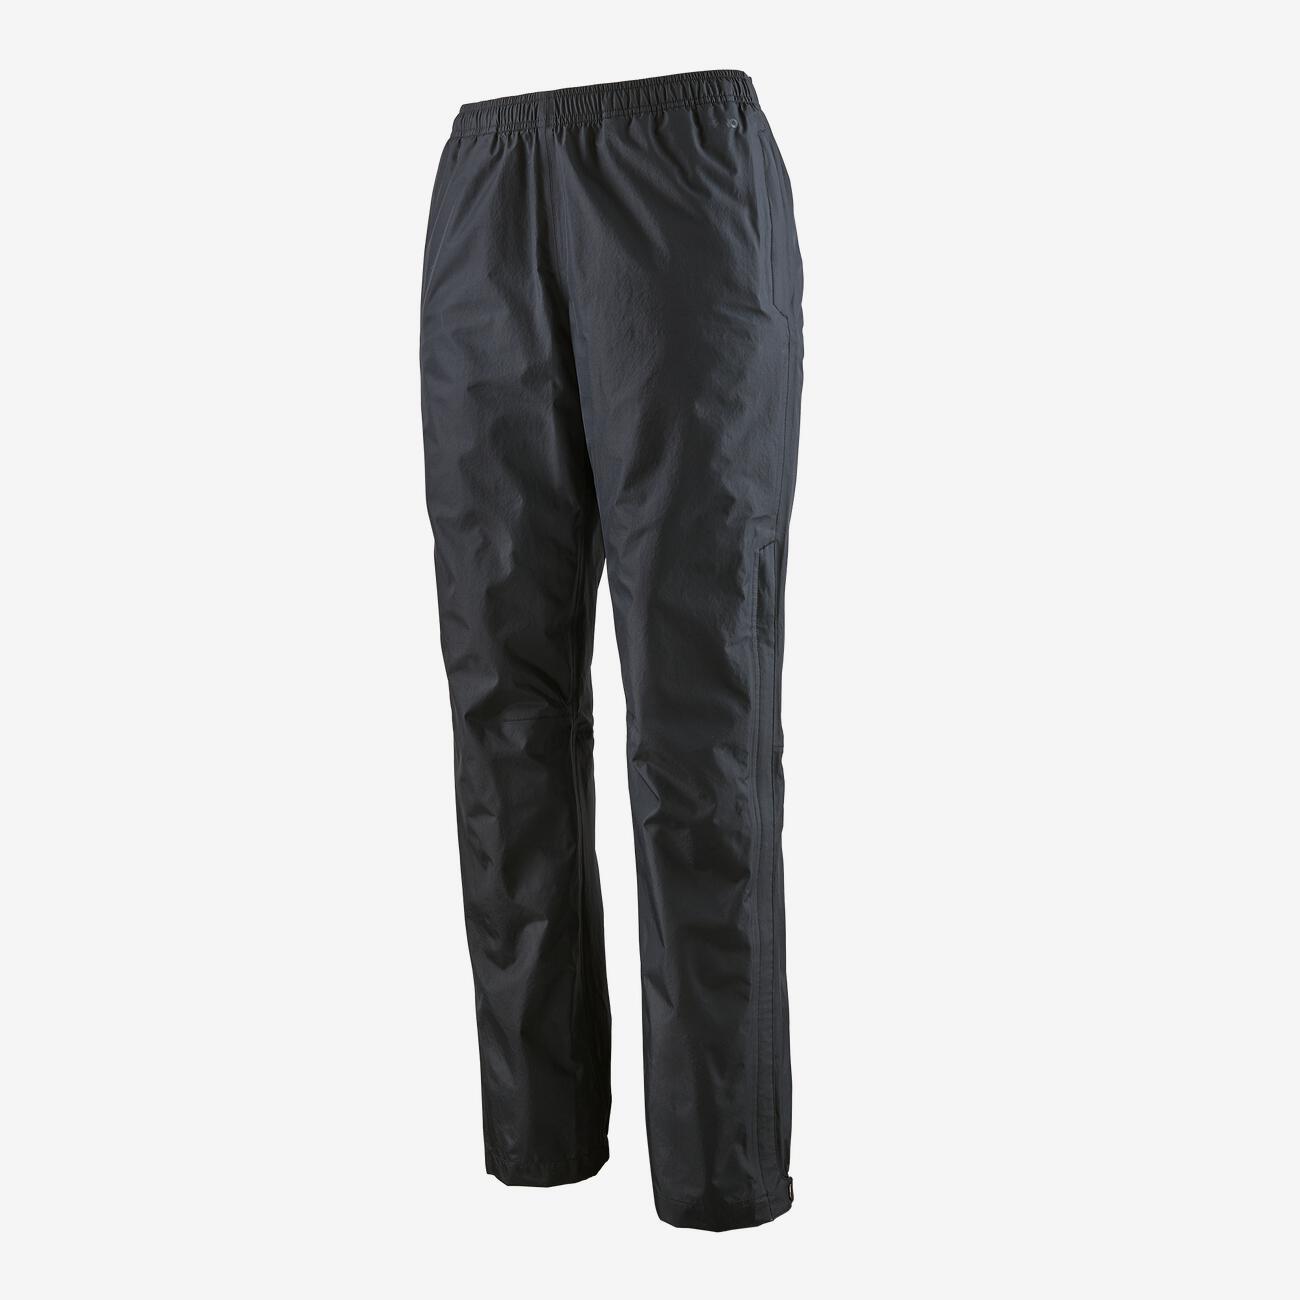 Torrentshell 3L Pants Short - Women's